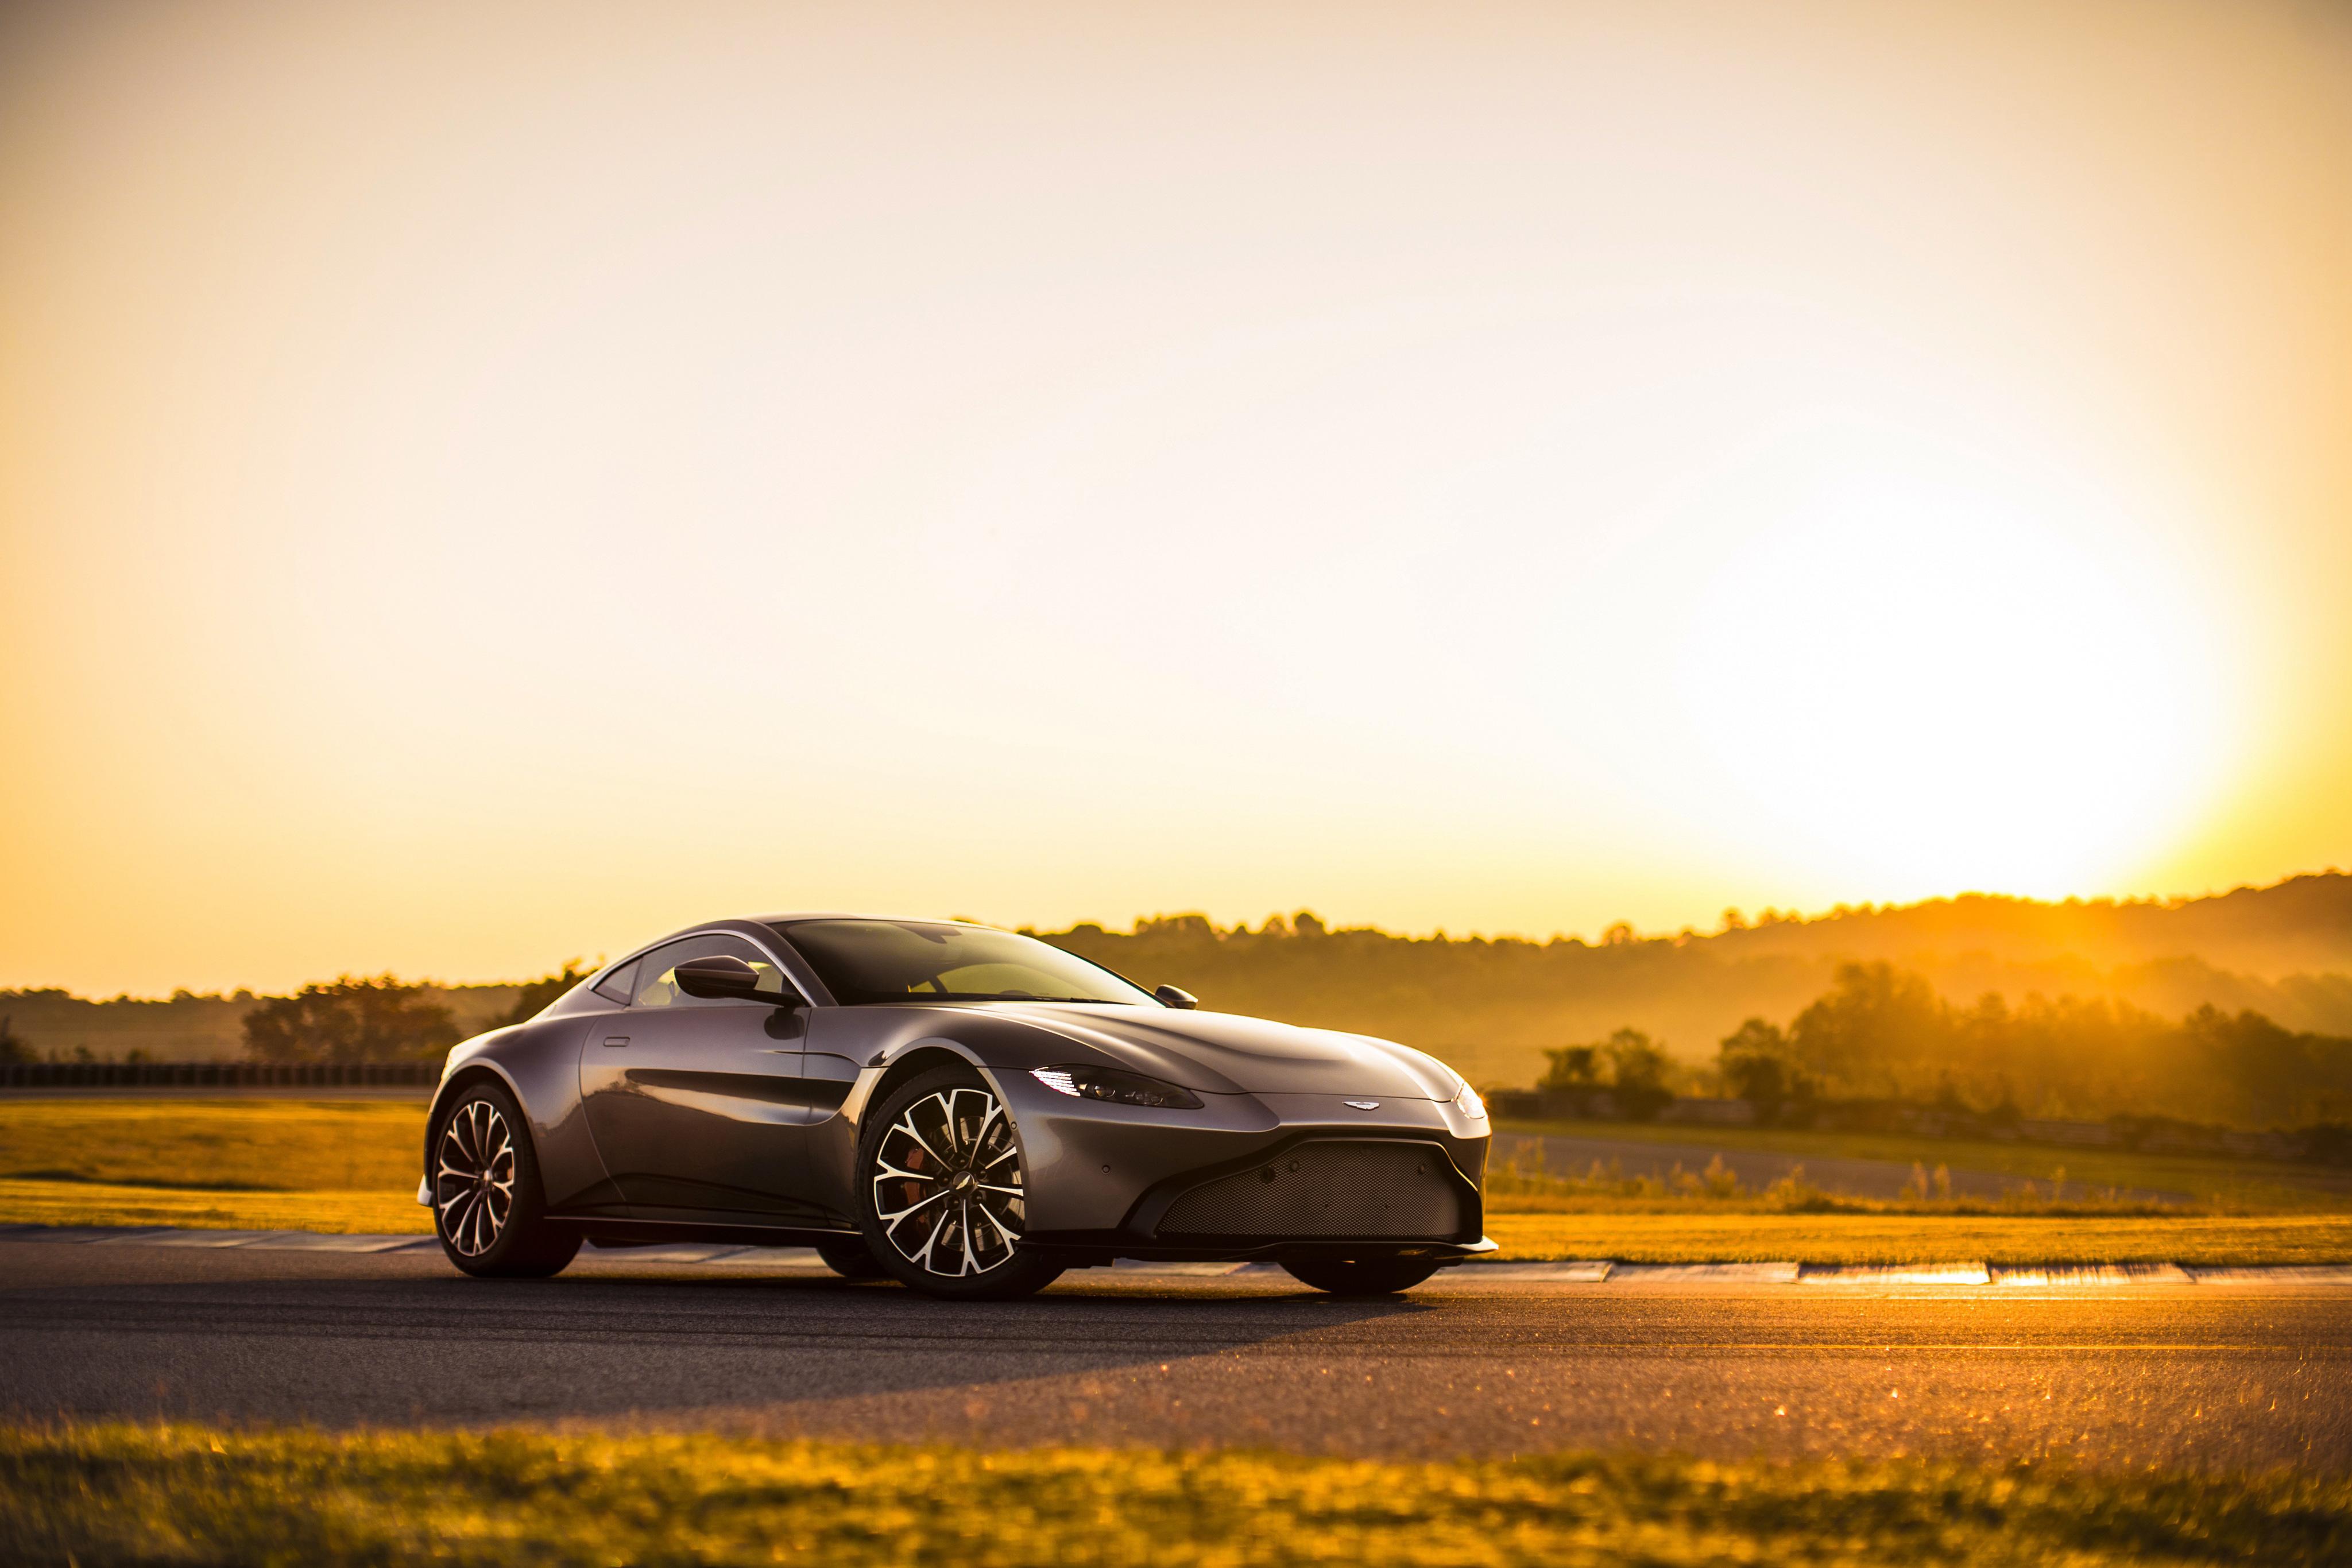 Luxury Aston Martin Sports Cars 4096x2731 Download Hd Wallpaper Wallpapertip